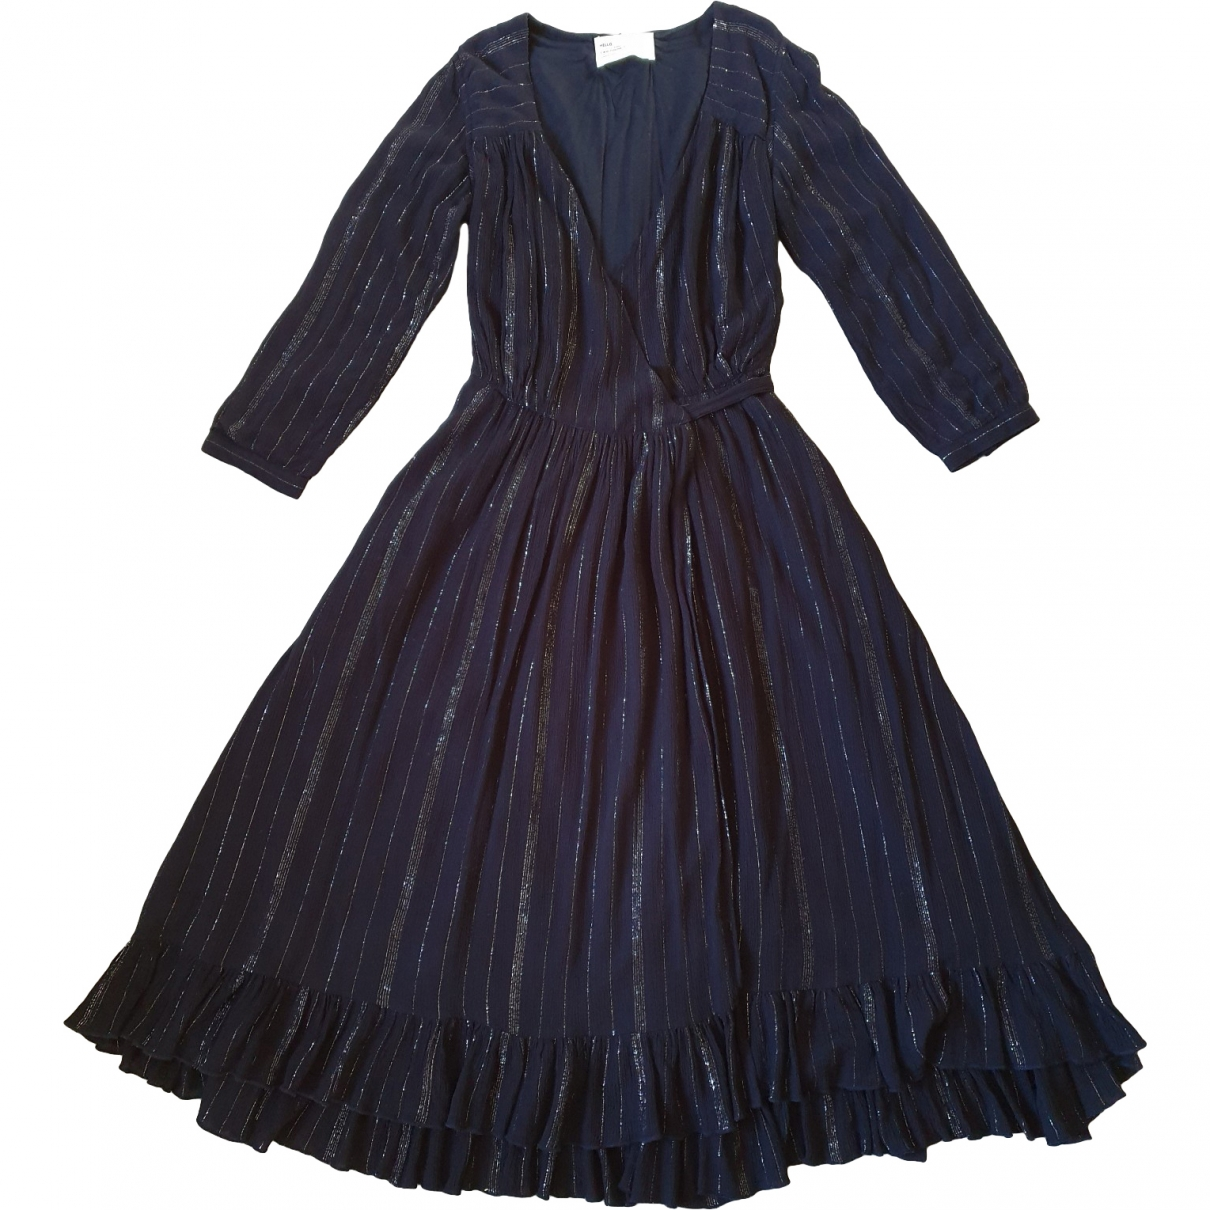 Leon & Harper \N Kleid in  Schwarz Viskose